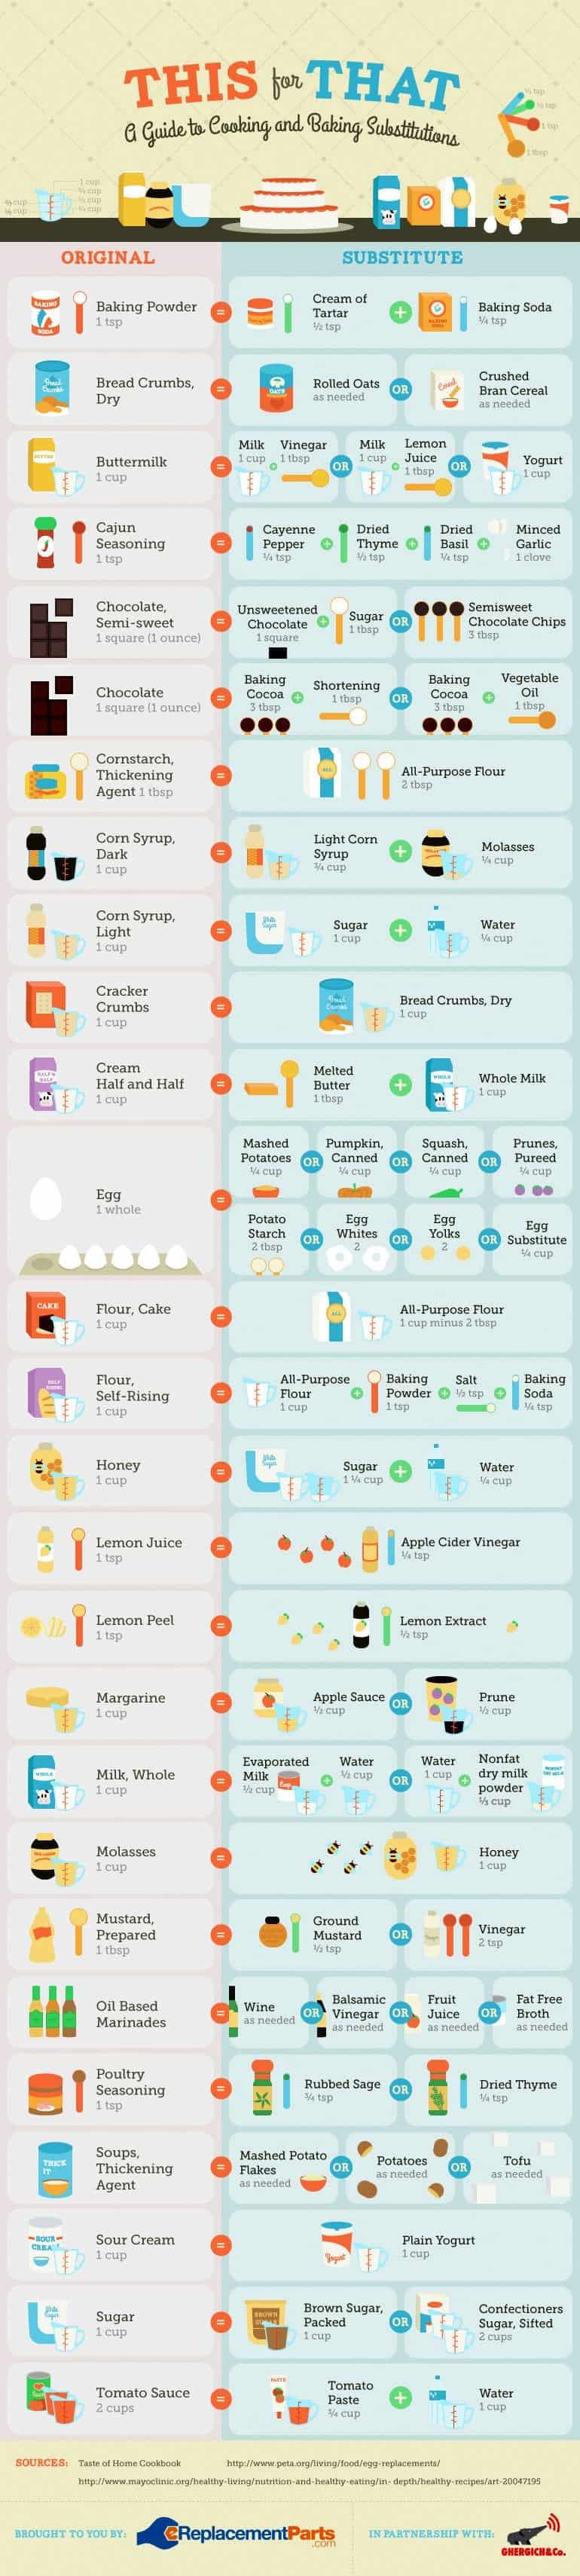 Ingredientes-que-podes-Substituir